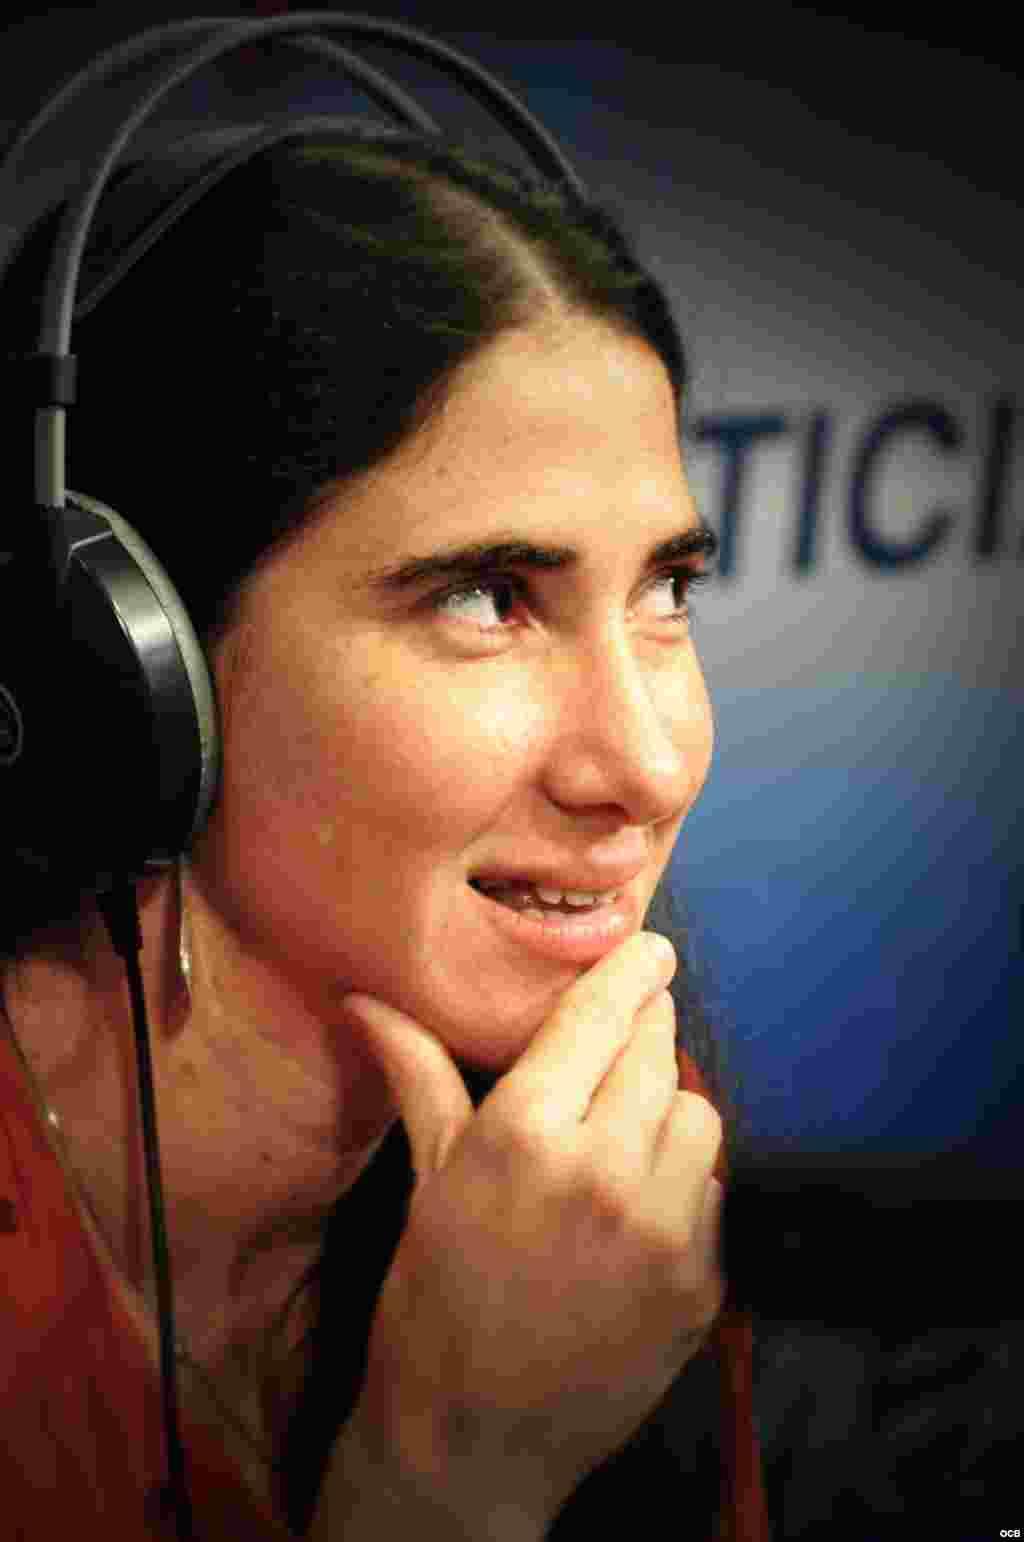 Blogger Yoani Sánchez on air at Radio Martí